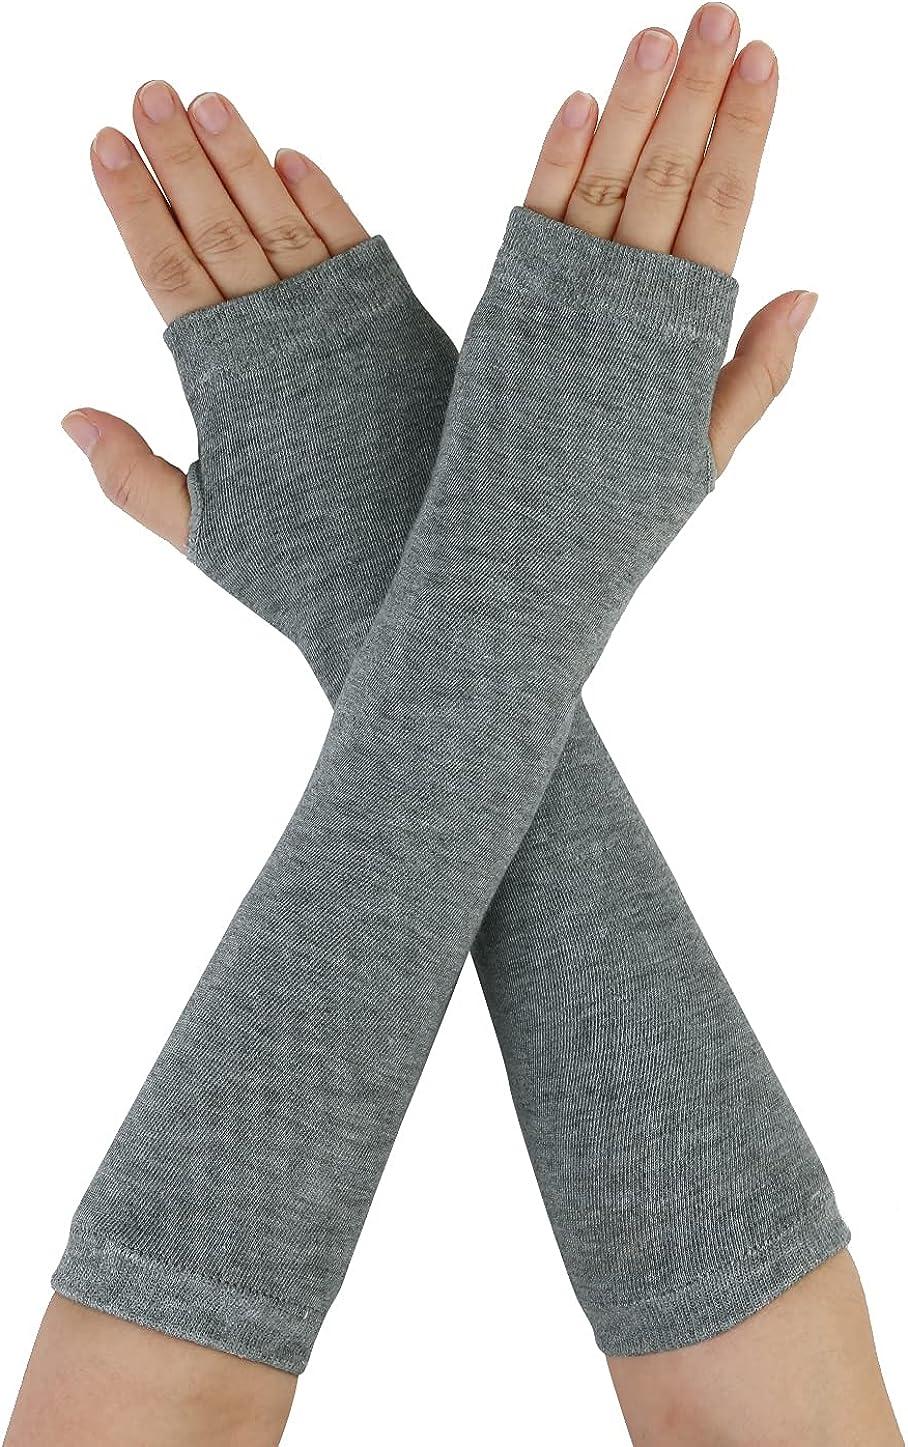 Allegra K Women Elastic Thumbless Fingerless Arm Warmers Gloves Gray